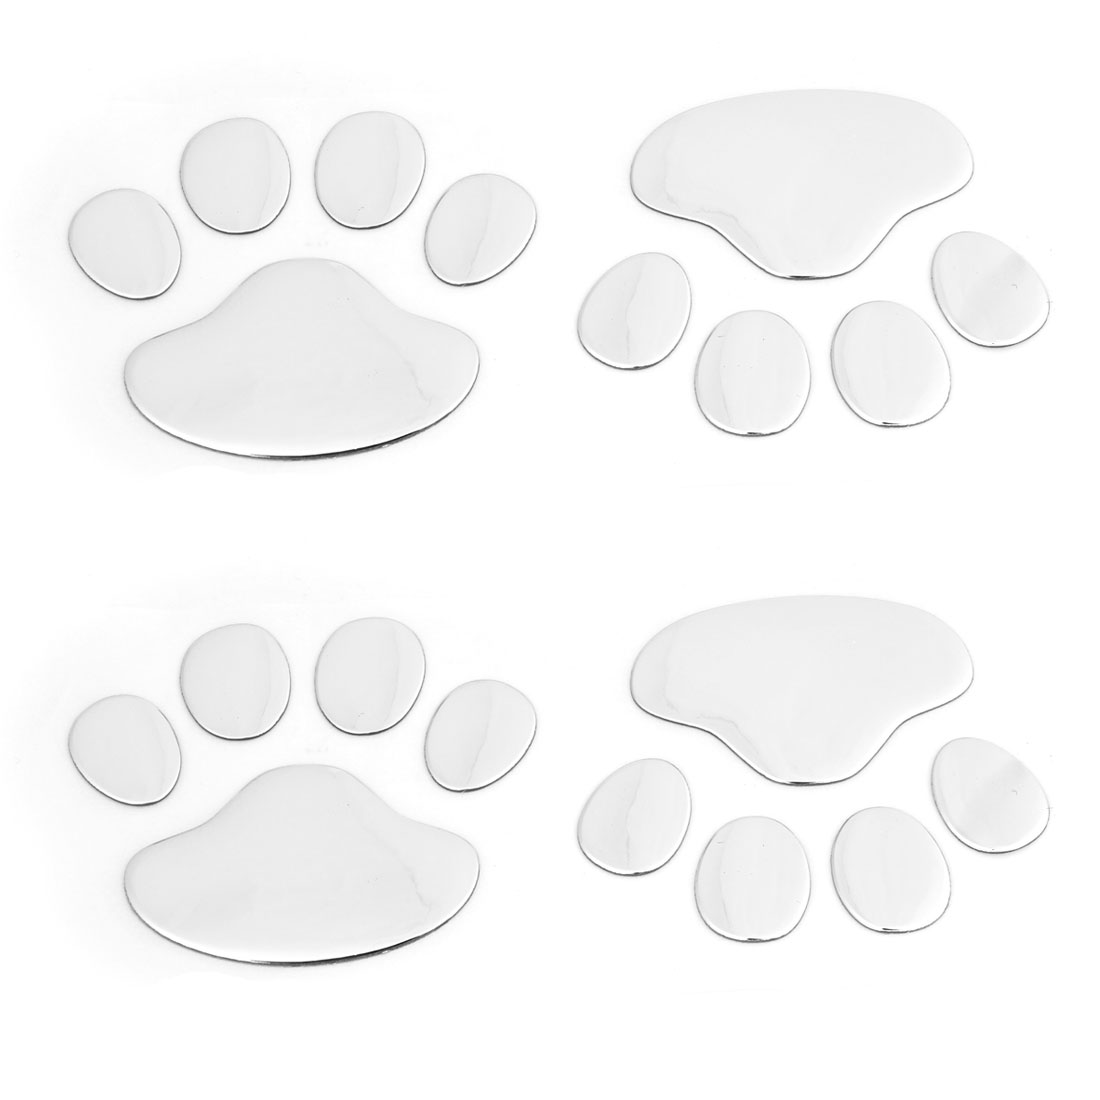 4 Pcs Dog Footprint Design Plastic Decoration 3D Badge Sticker for Vehicle Car